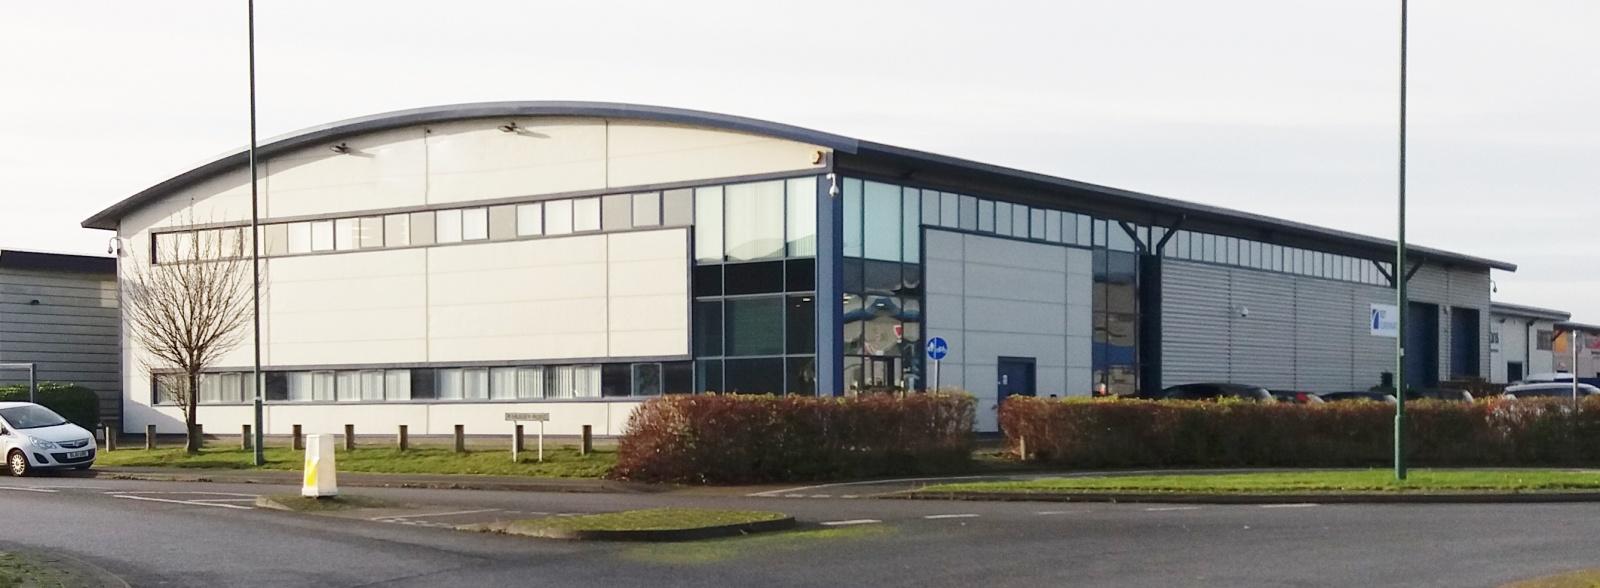 Unit 13 Knights Way, Battlefield Enterprise Park, Shrewsbury, Shropshire